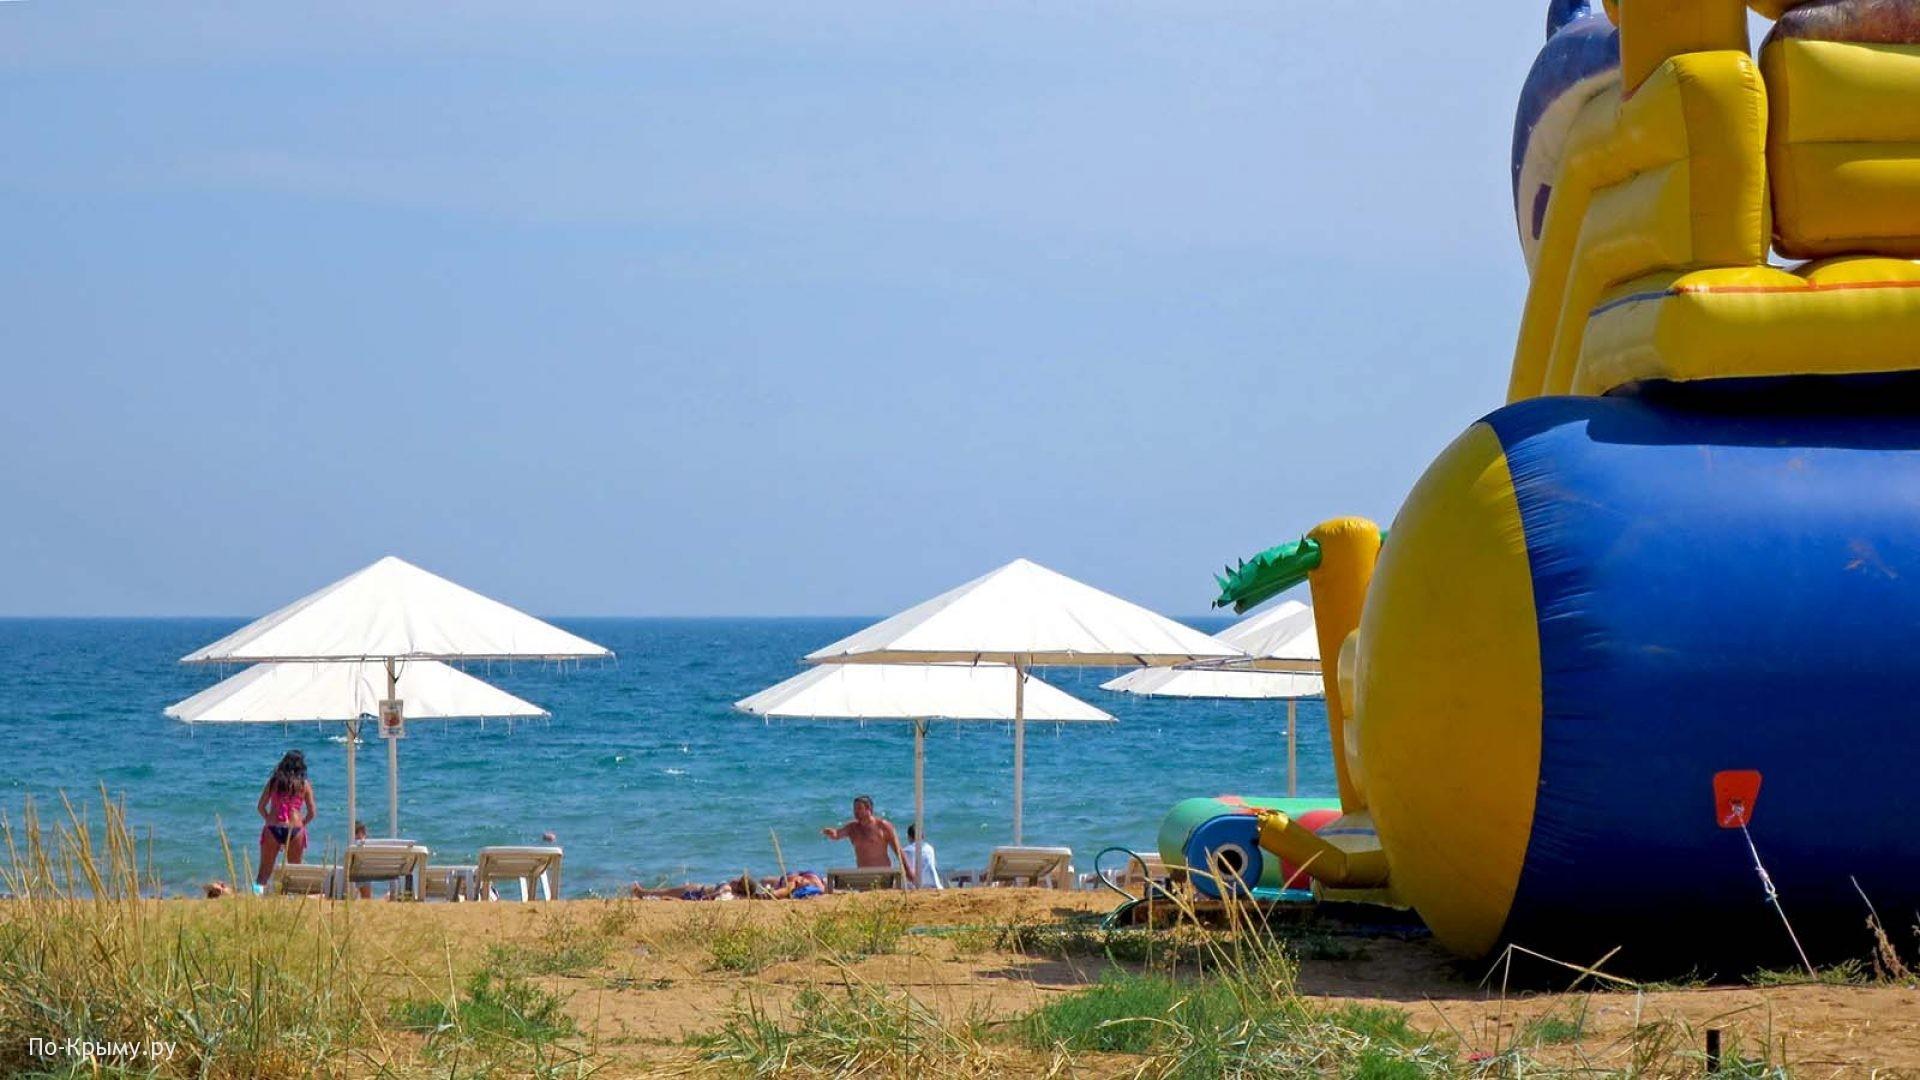 Песчаные пляжи Феодосийского залива